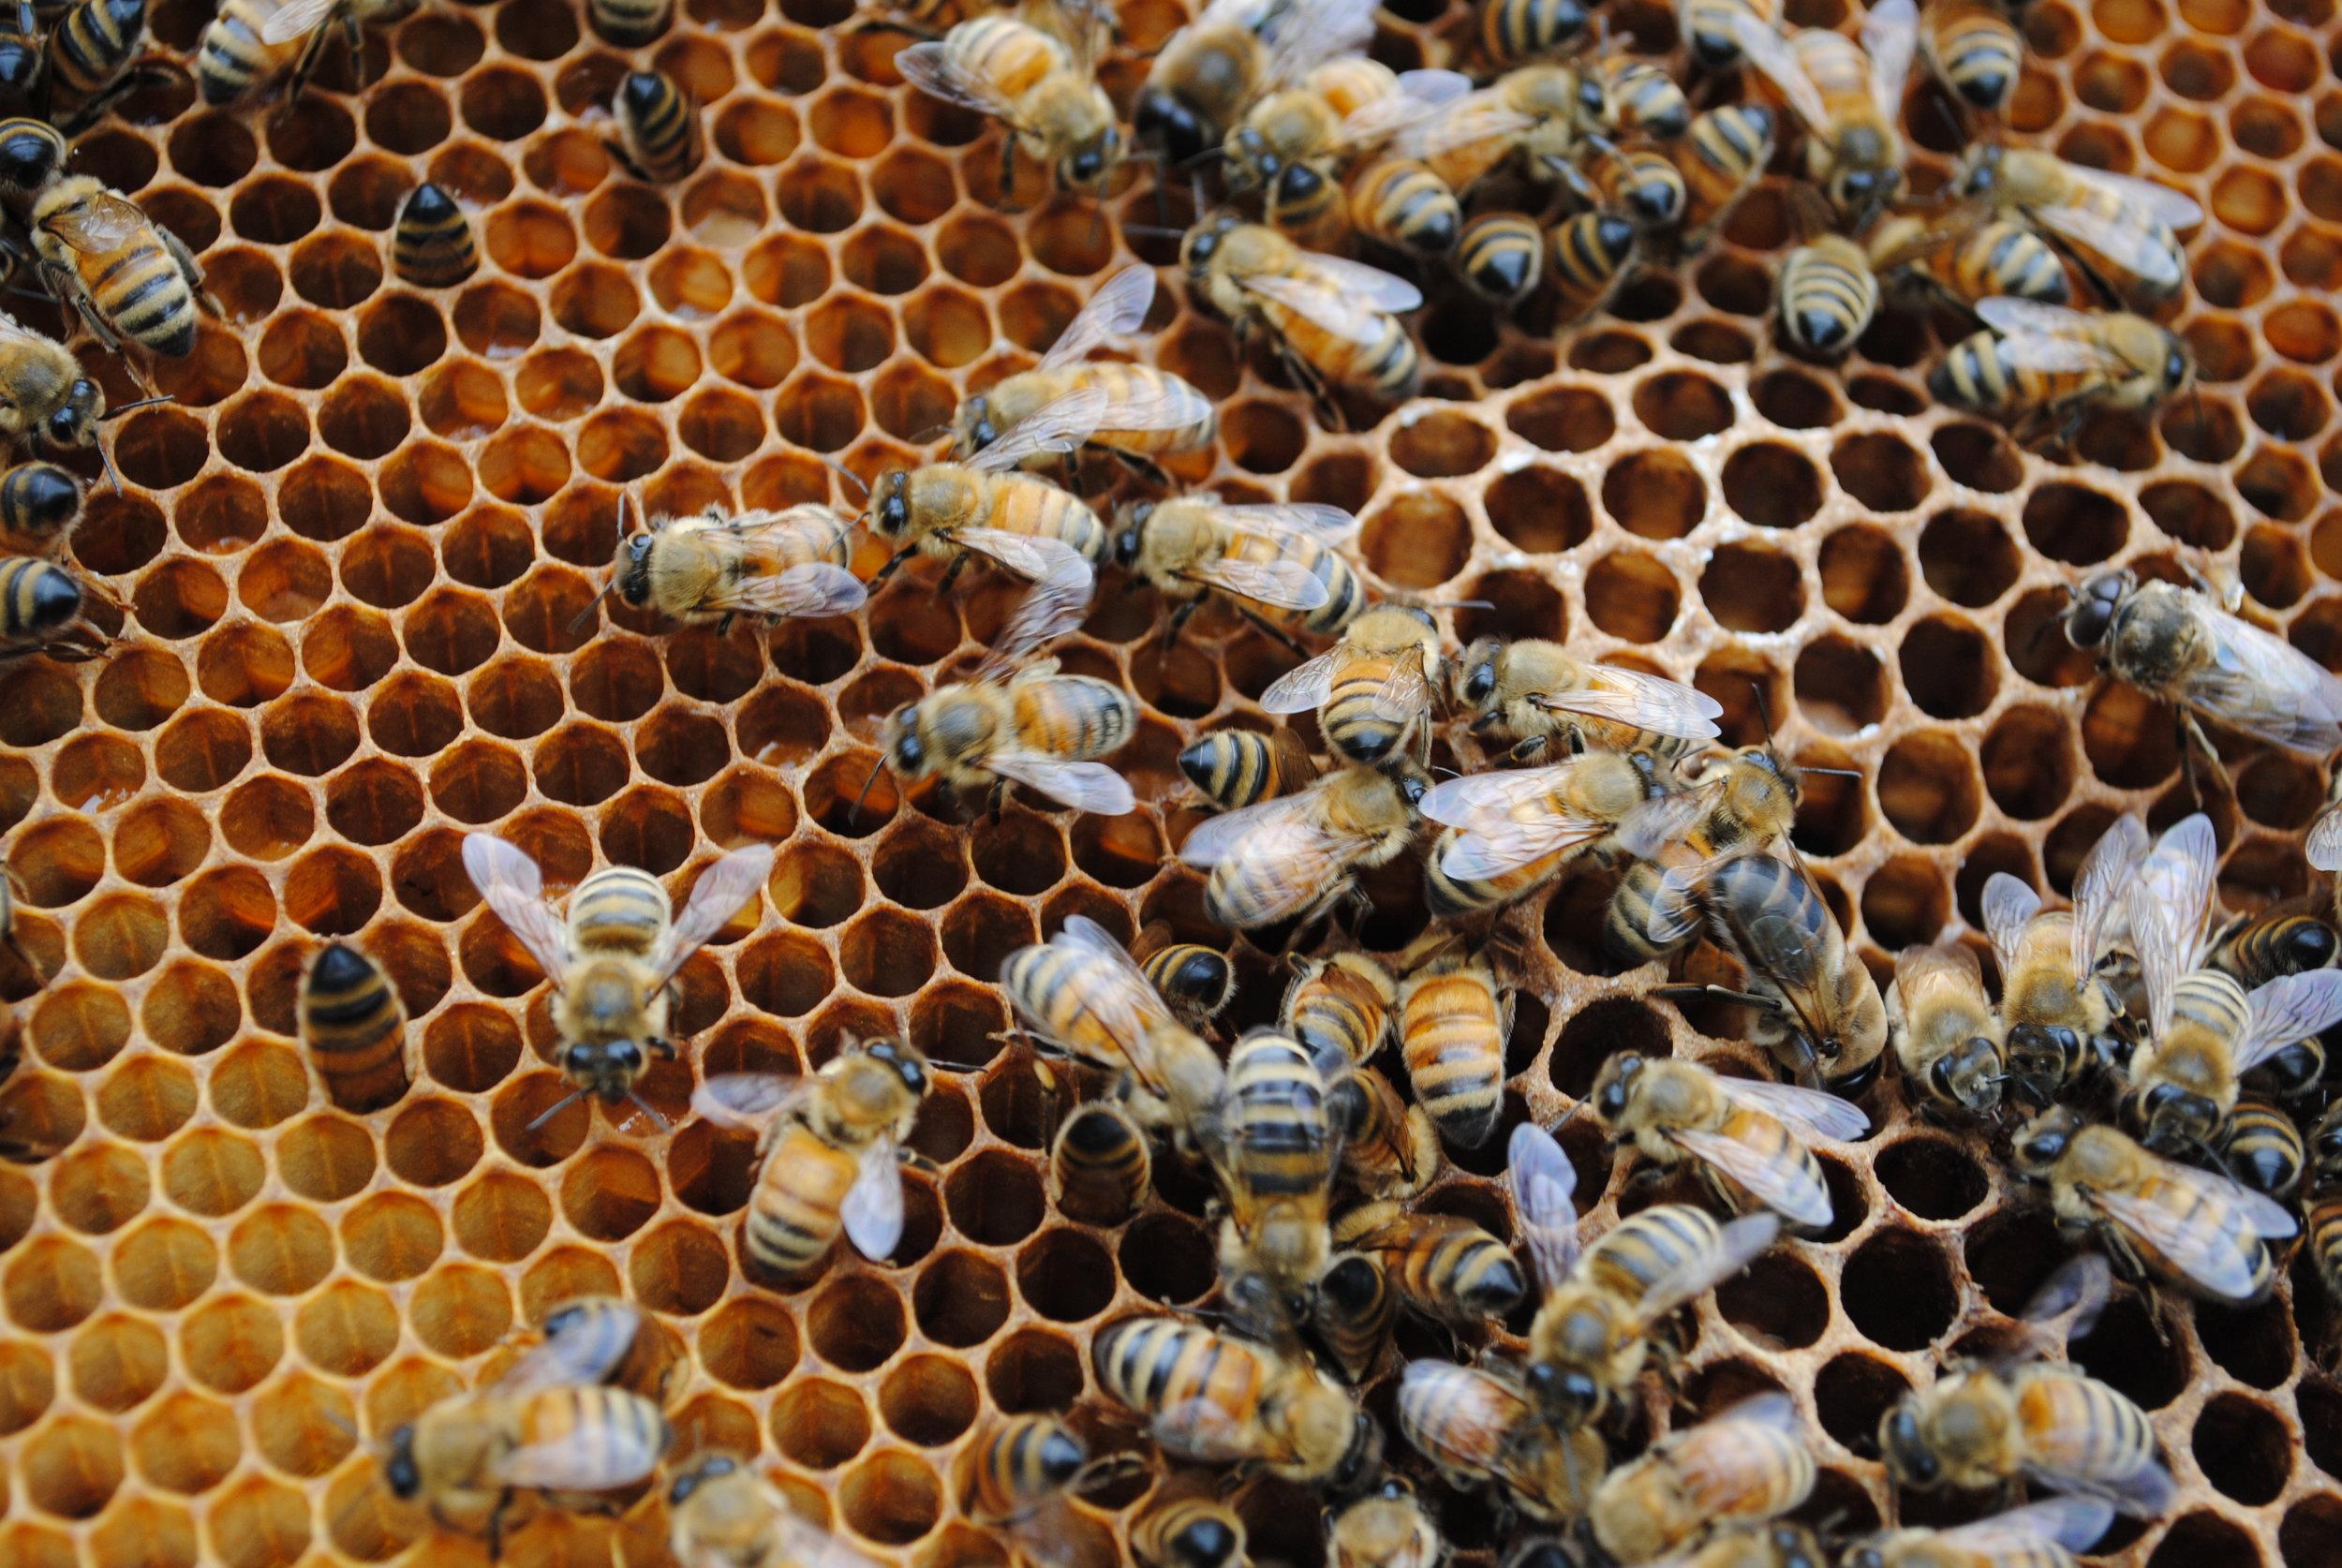 Honeybees ( Apis mellifera ) on comb